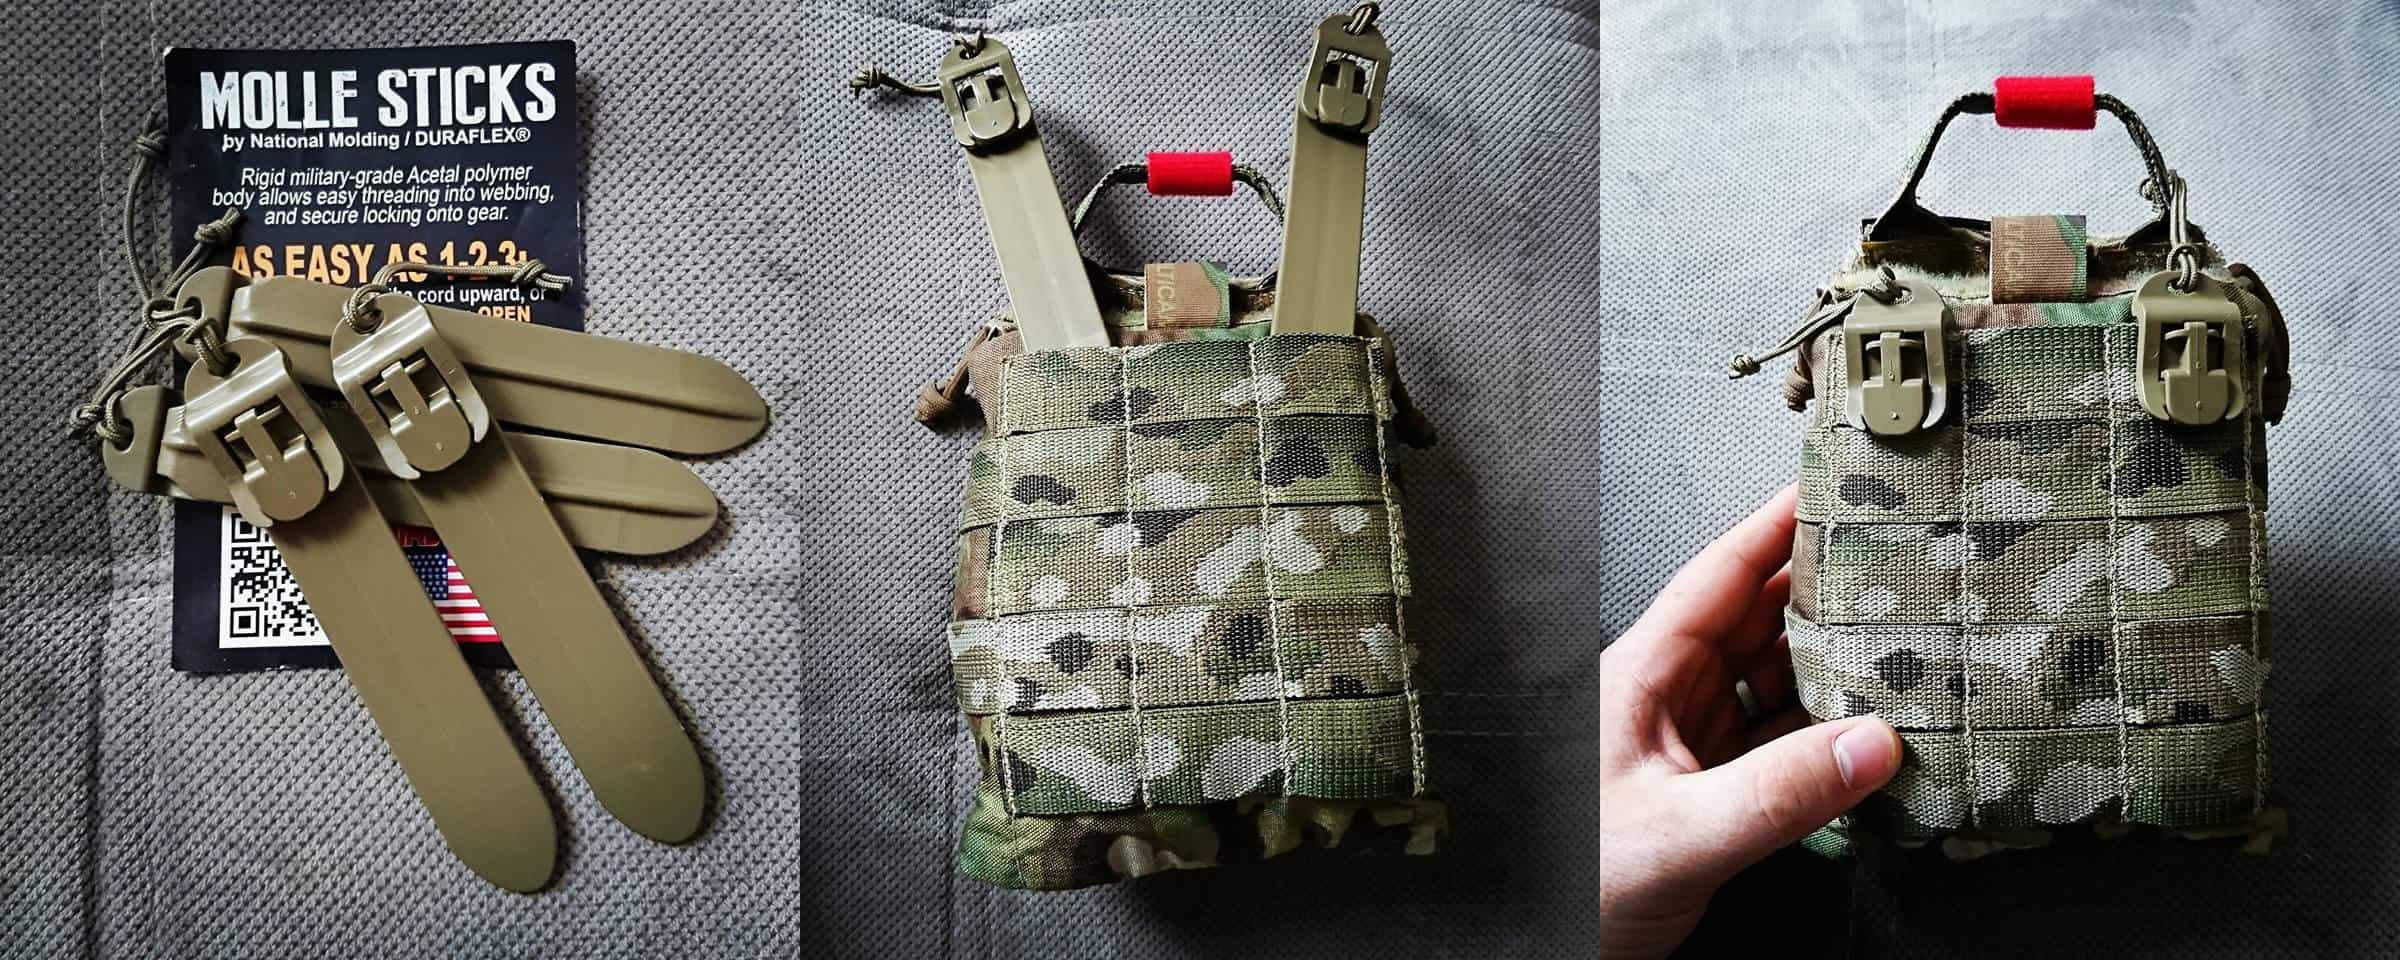 Pack Essential: MOLLE Sticks MOLLEStick-02